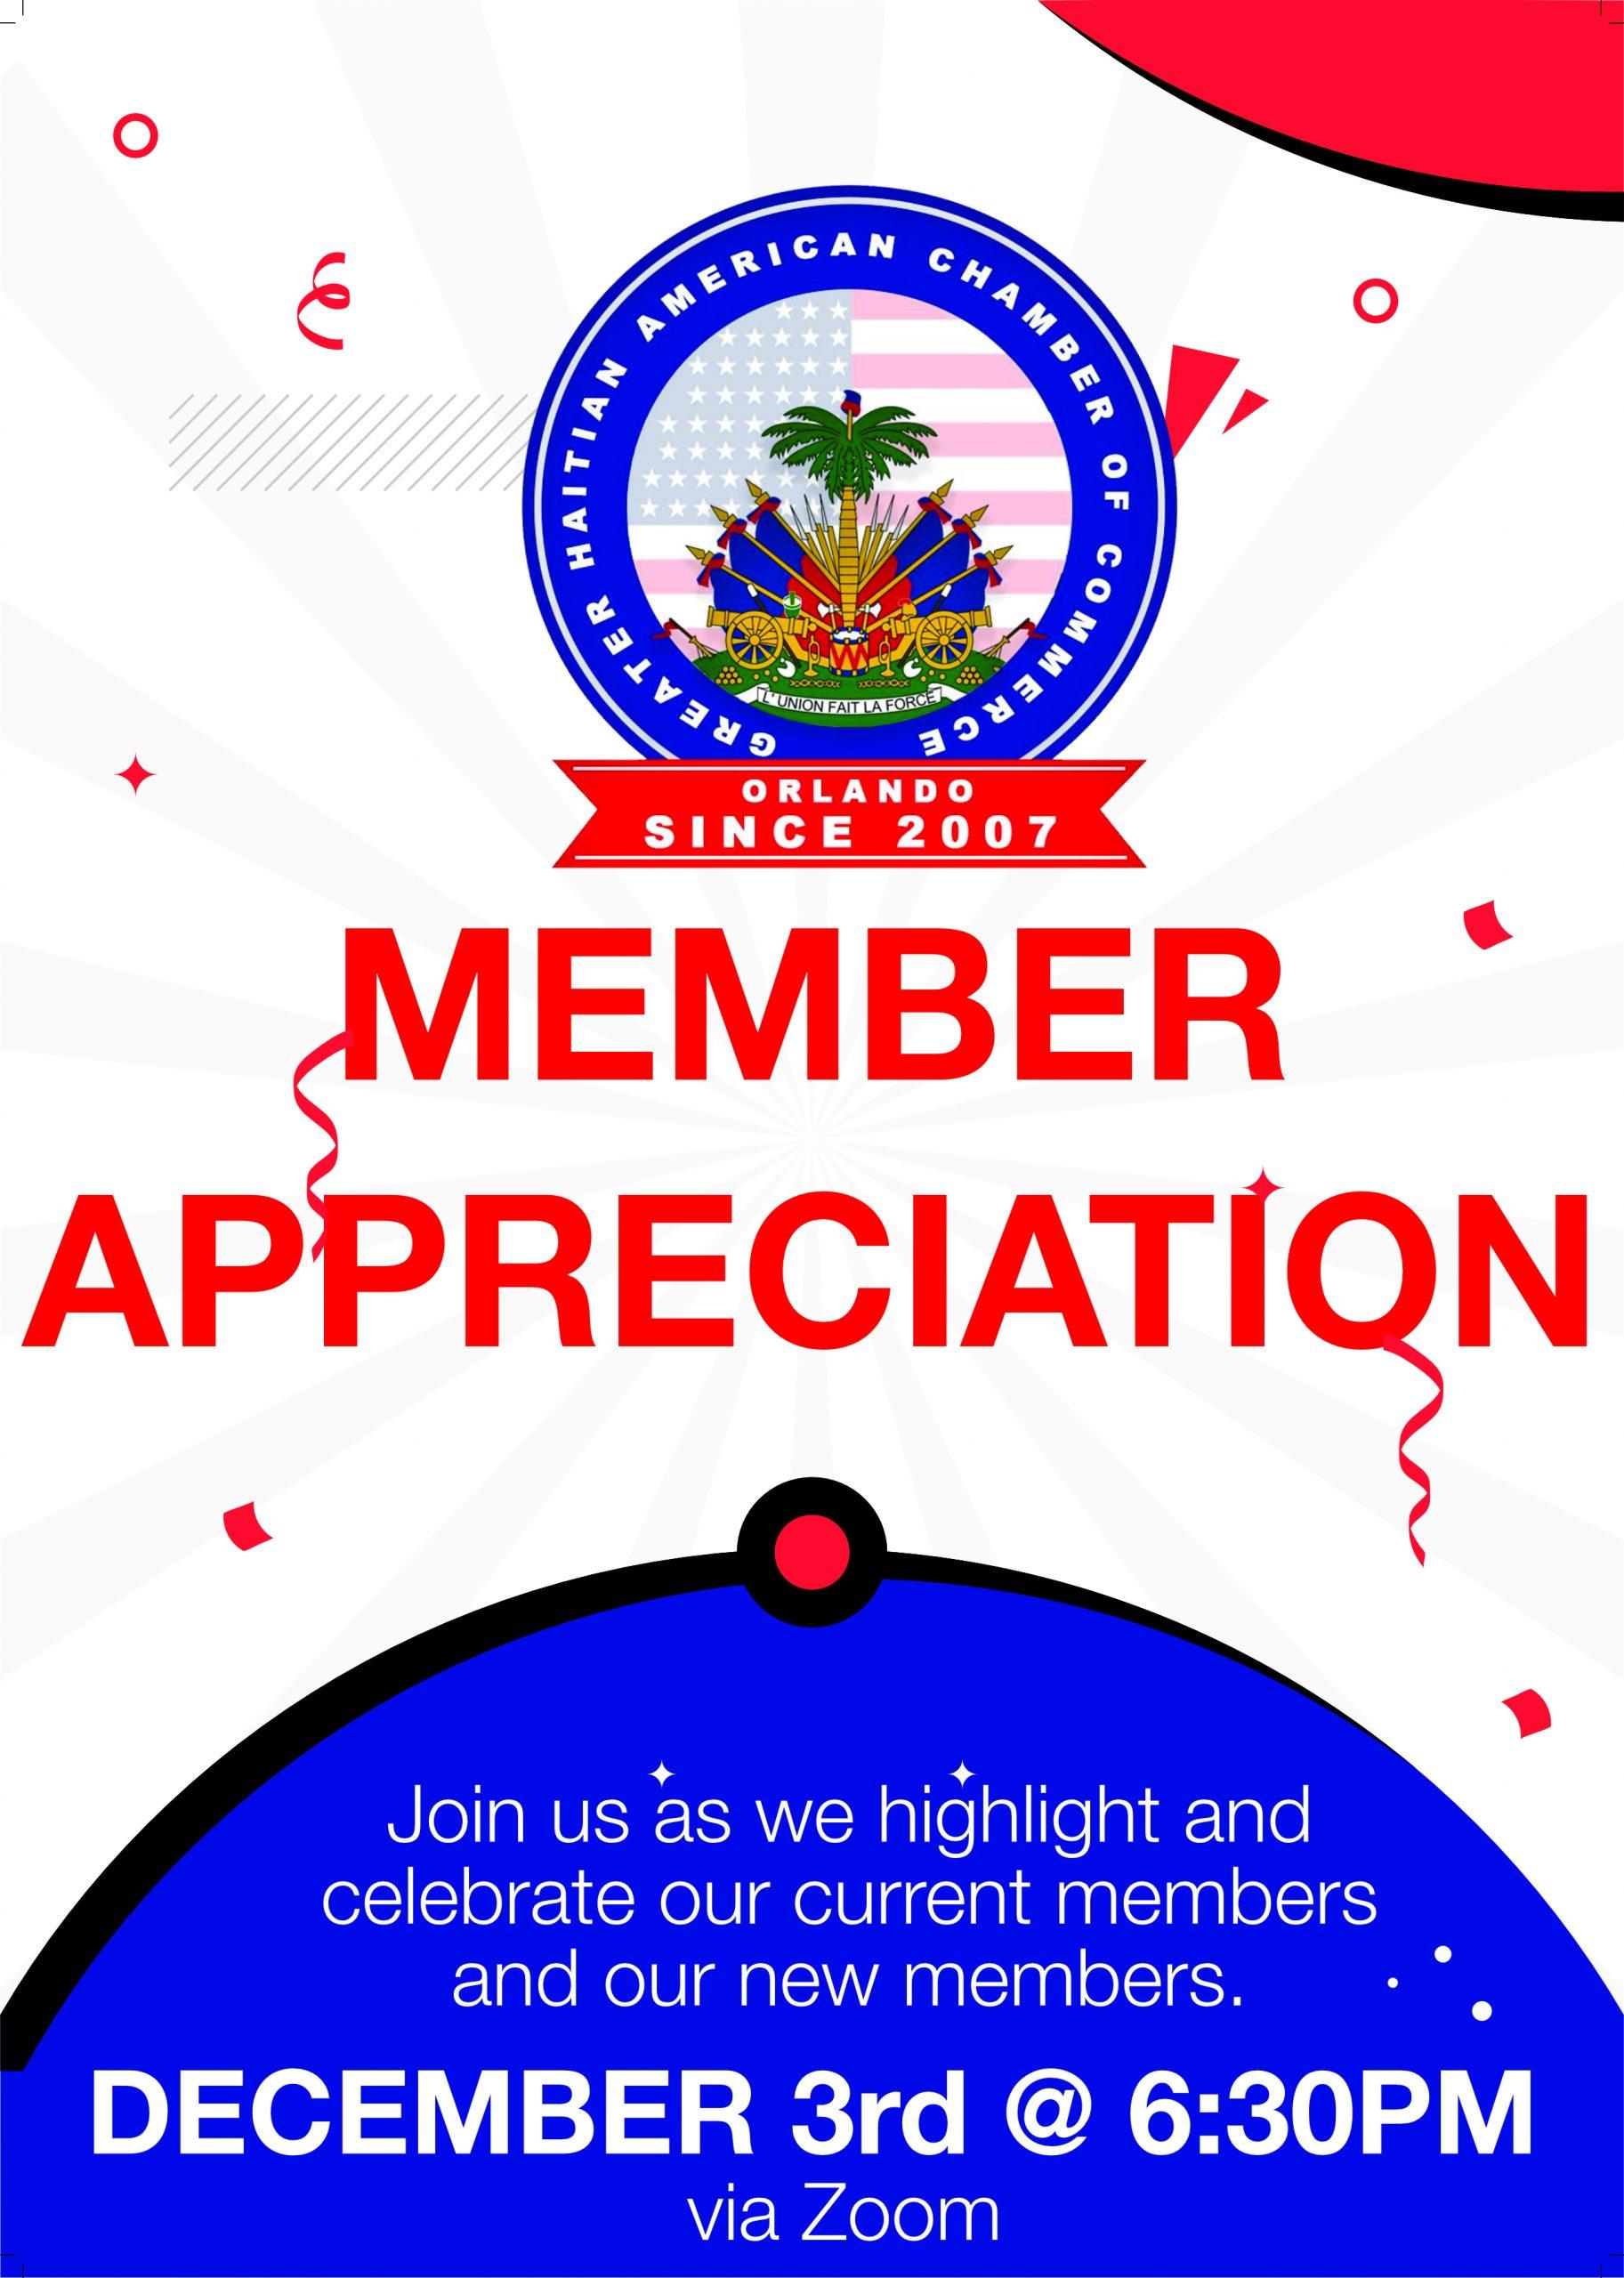 Member Appreciation 2020